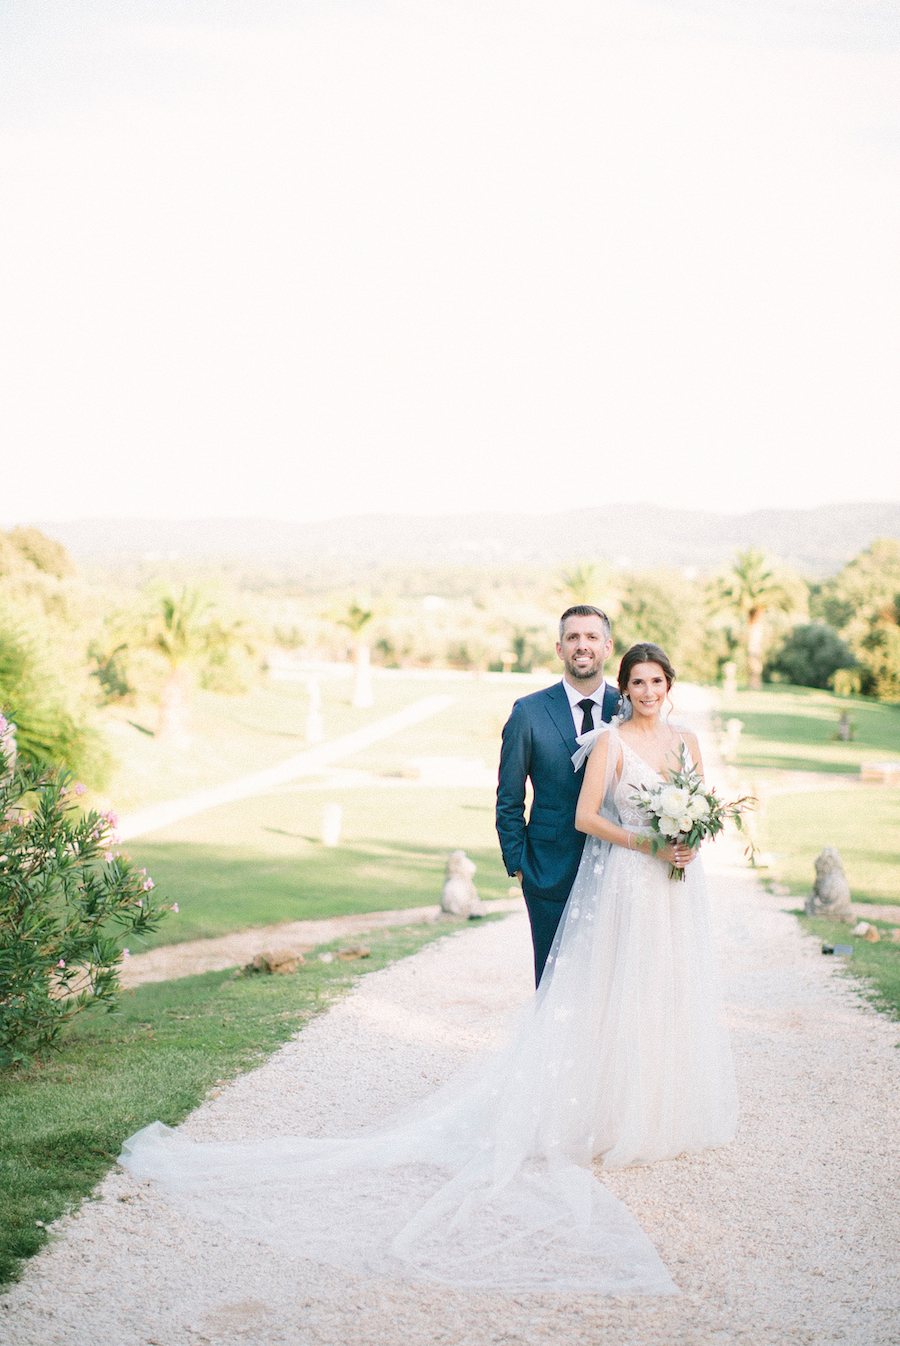 saya-photography-wedding-photographer-provence-chateau-de-robernier-114.jpg